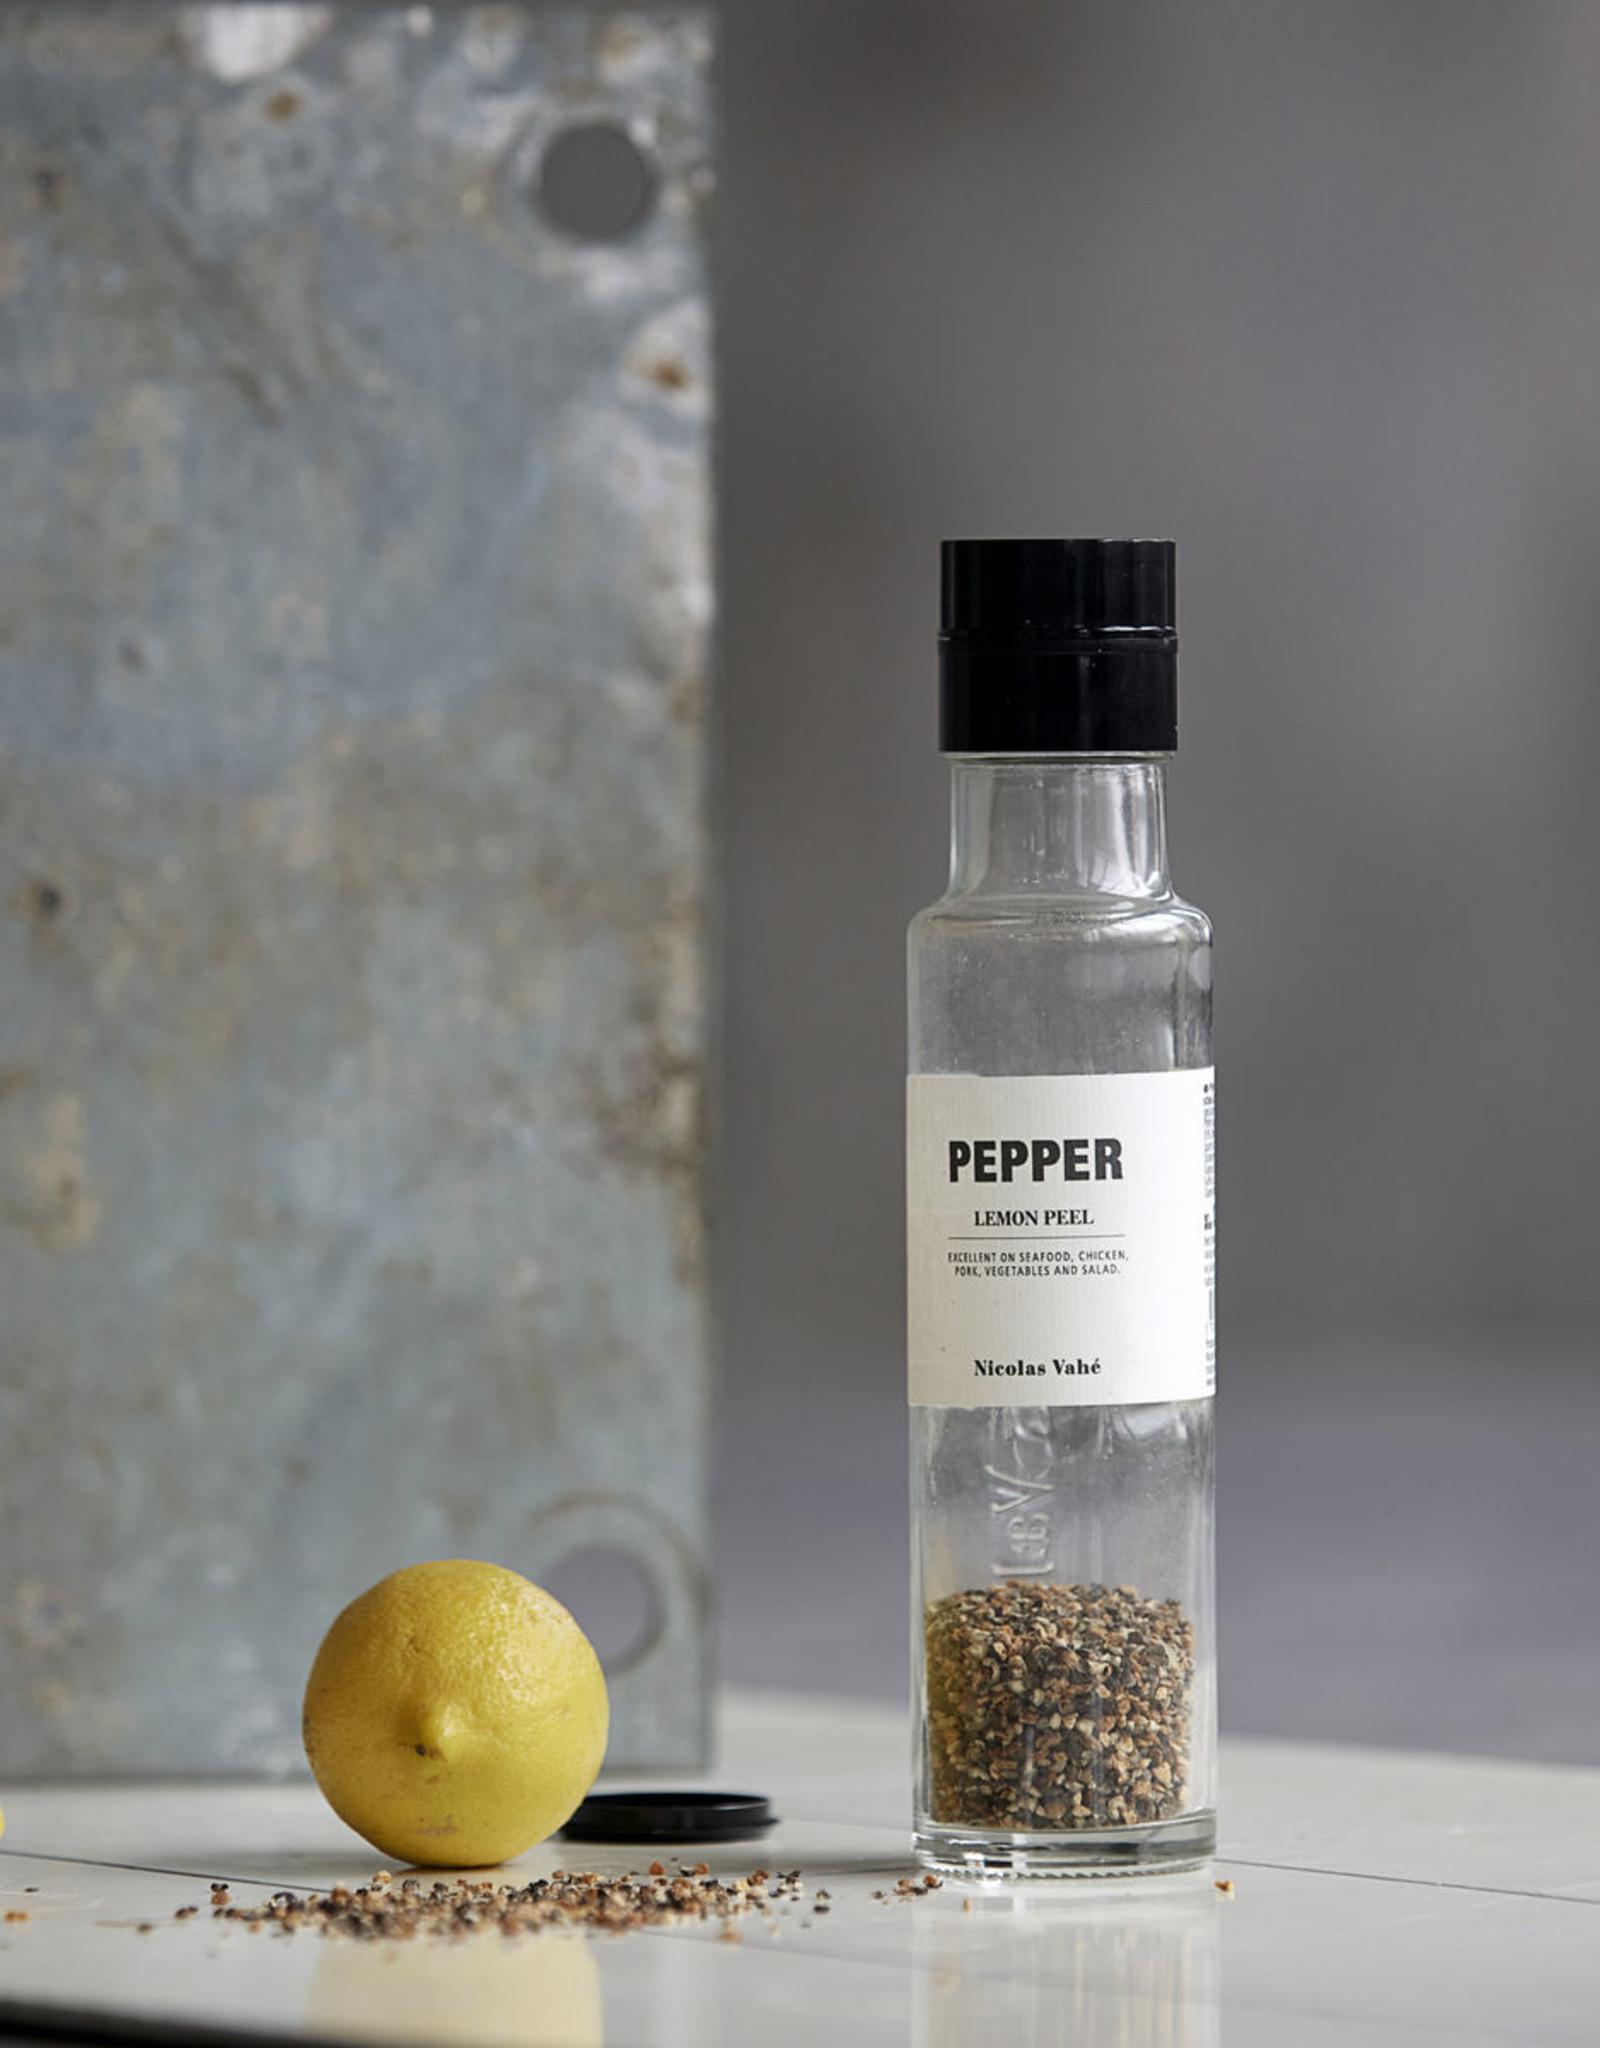 Nicolas Vahé Nicolas Vahé Pepper-lemon peel